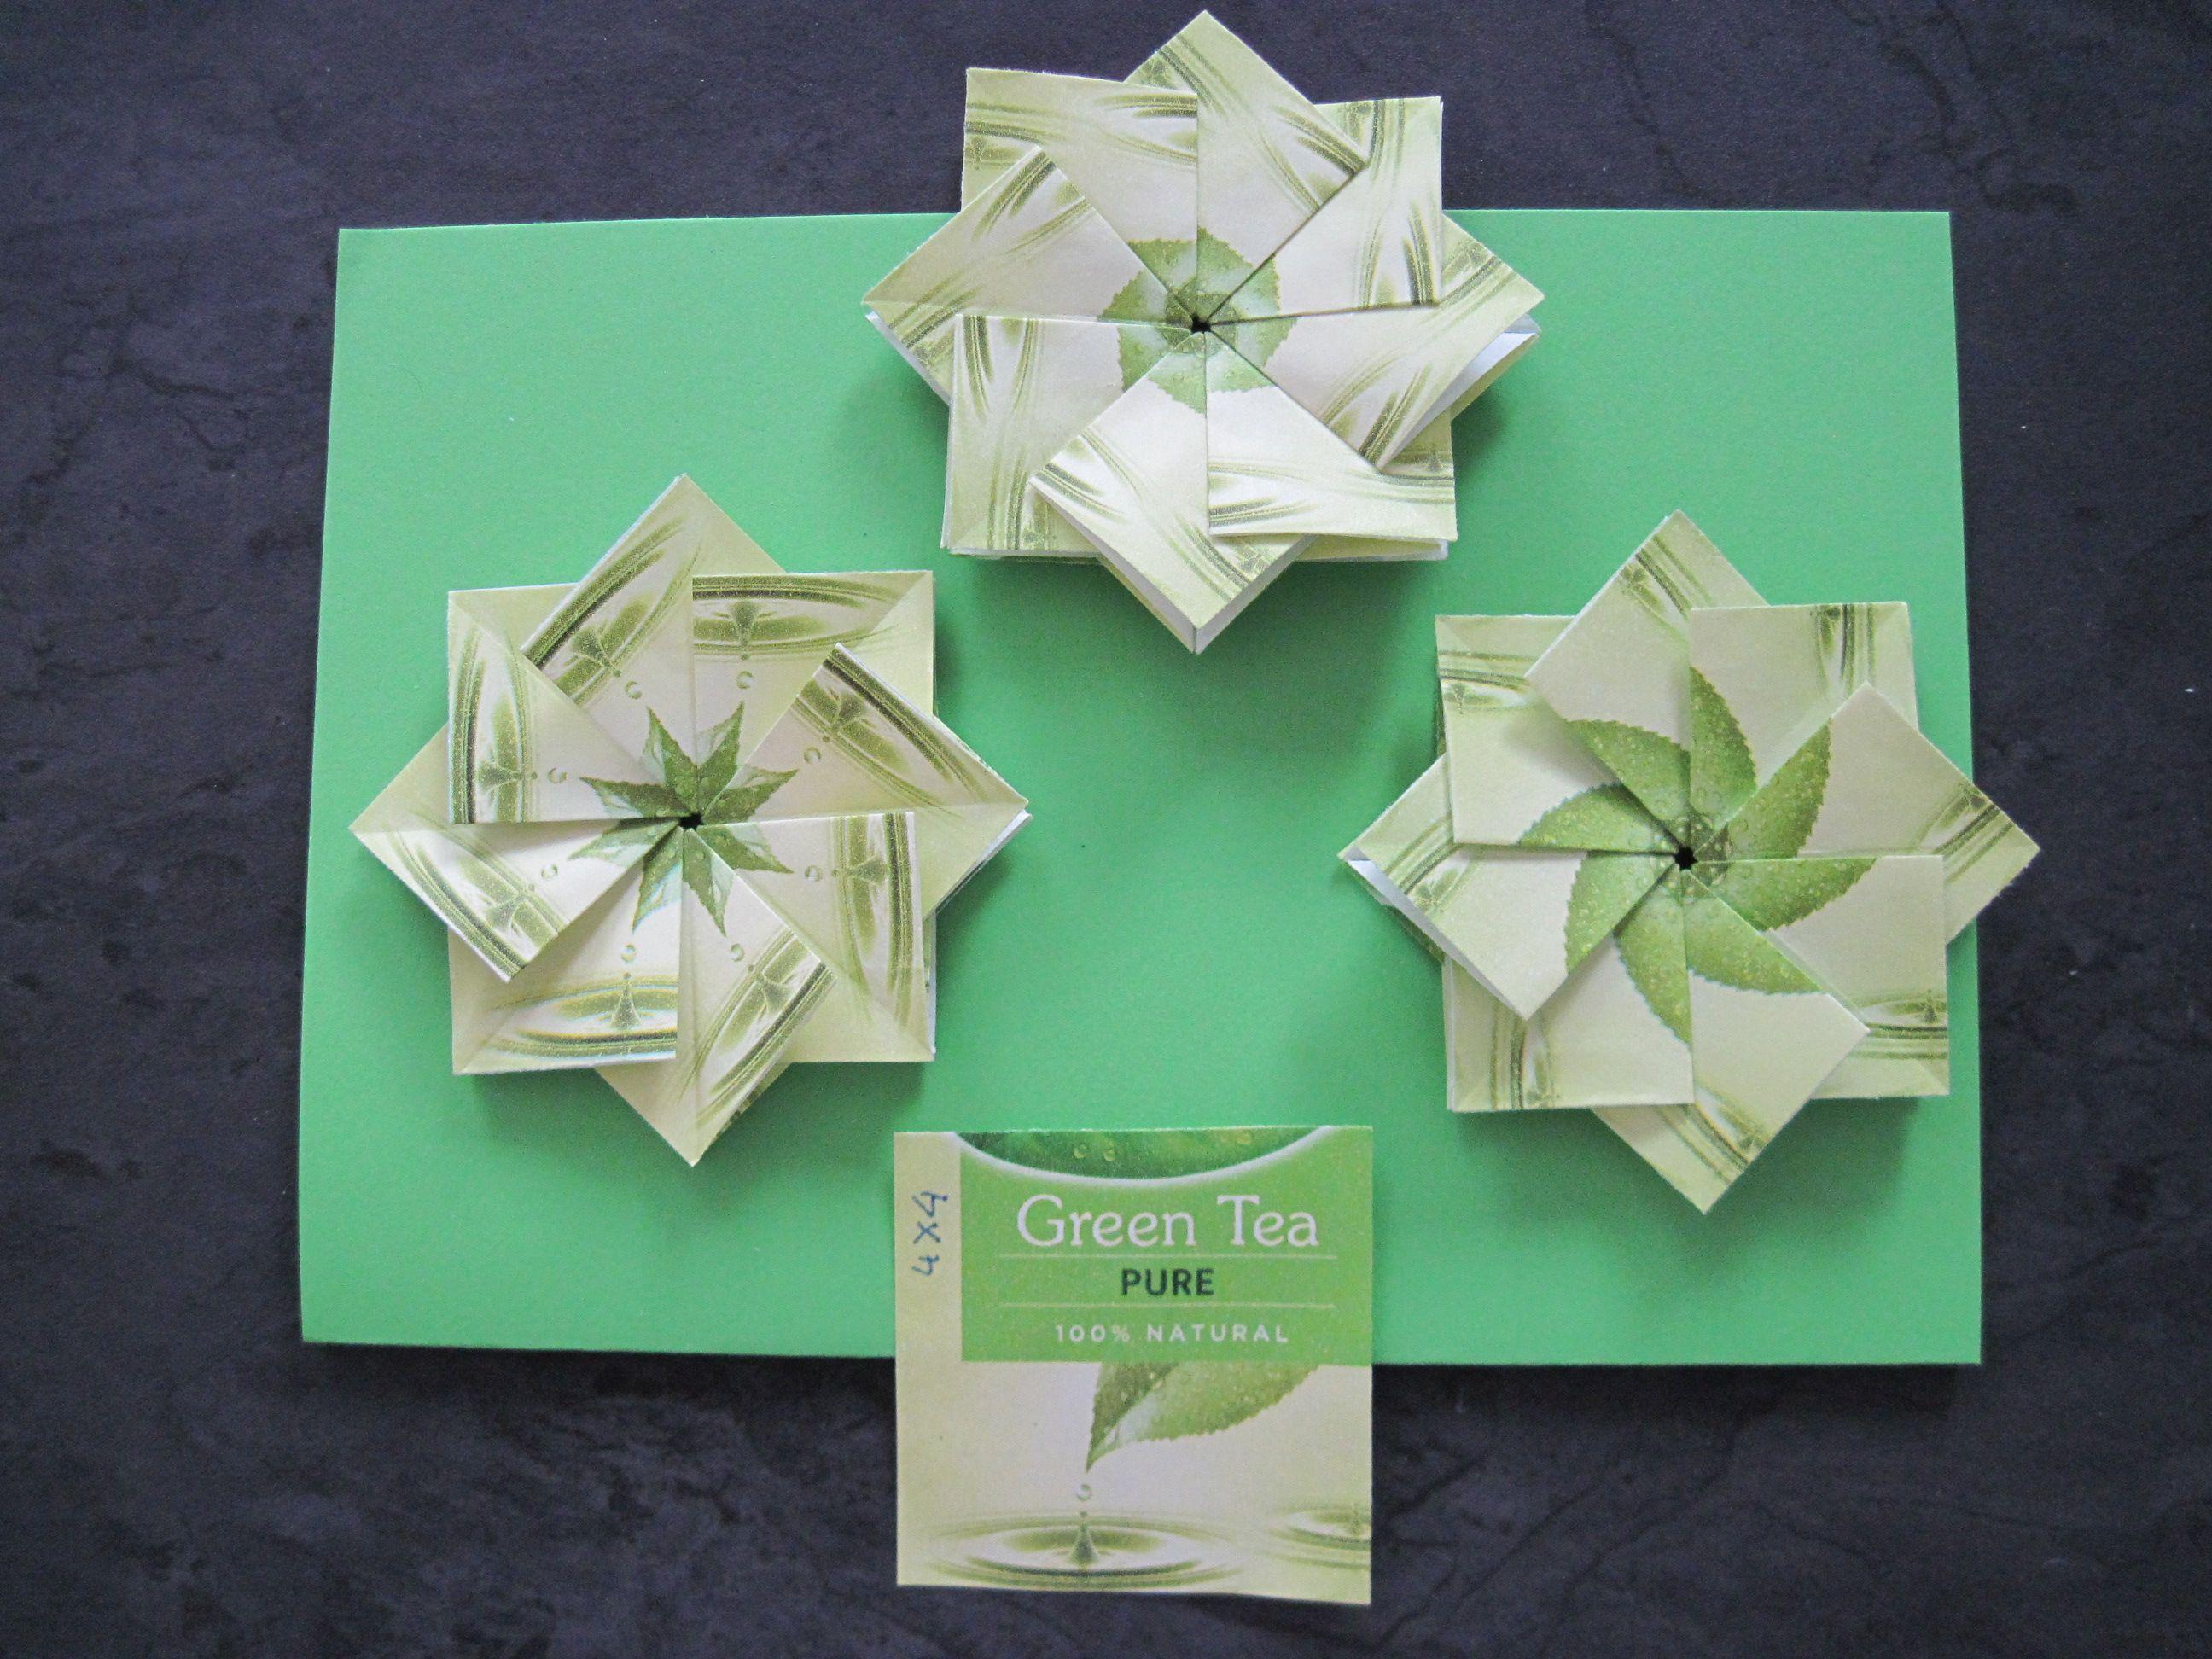 Pickwick theezakjes Green Tea Pure - 4x4cm